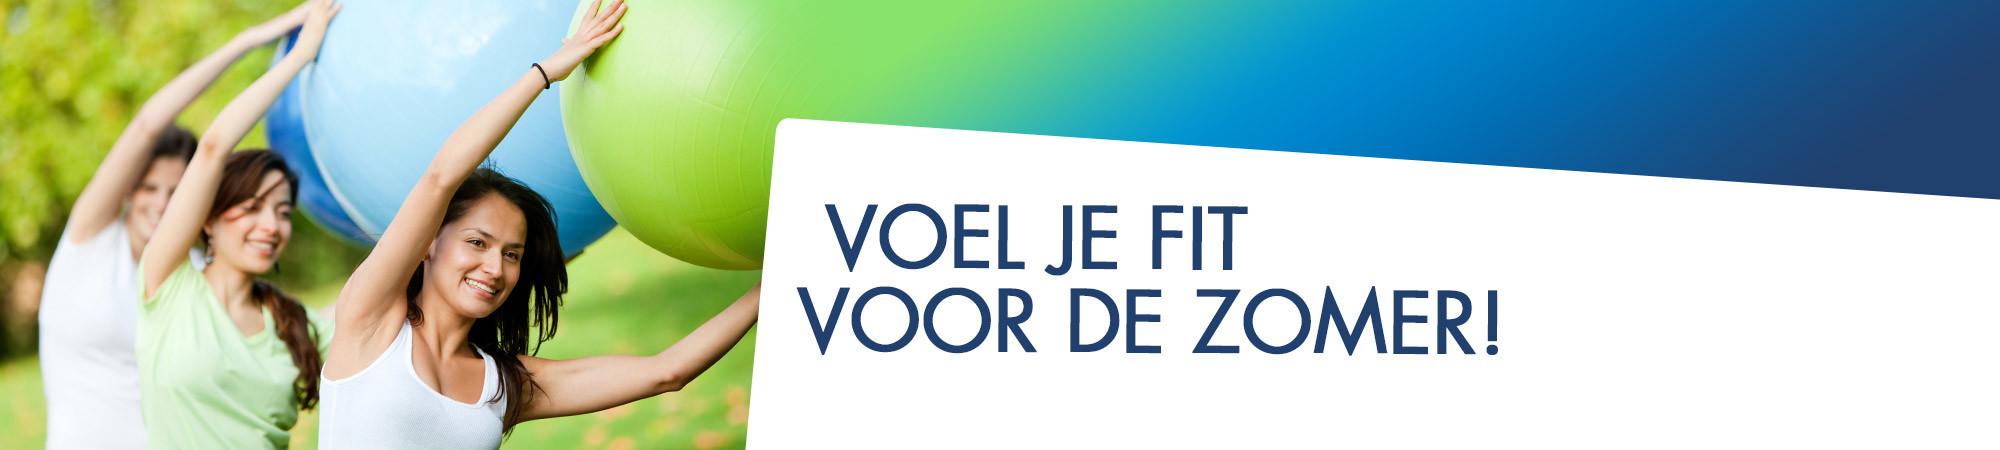 Hfd_1-zomer-fit-pakket-sanasport